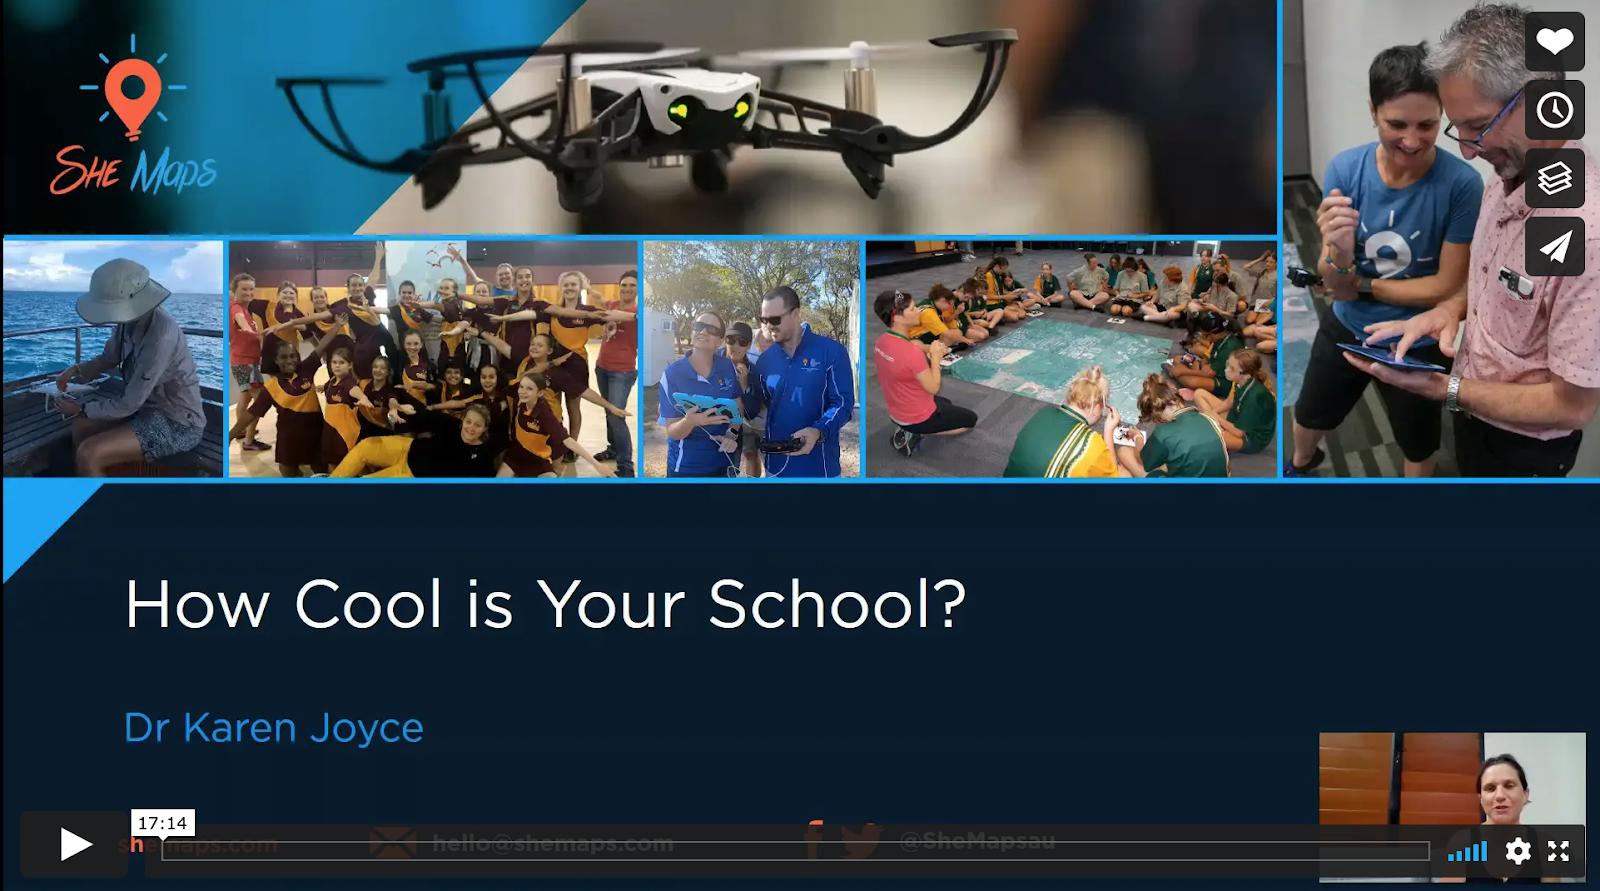 How Cool is Your School presentation by Dr Karen Joyce